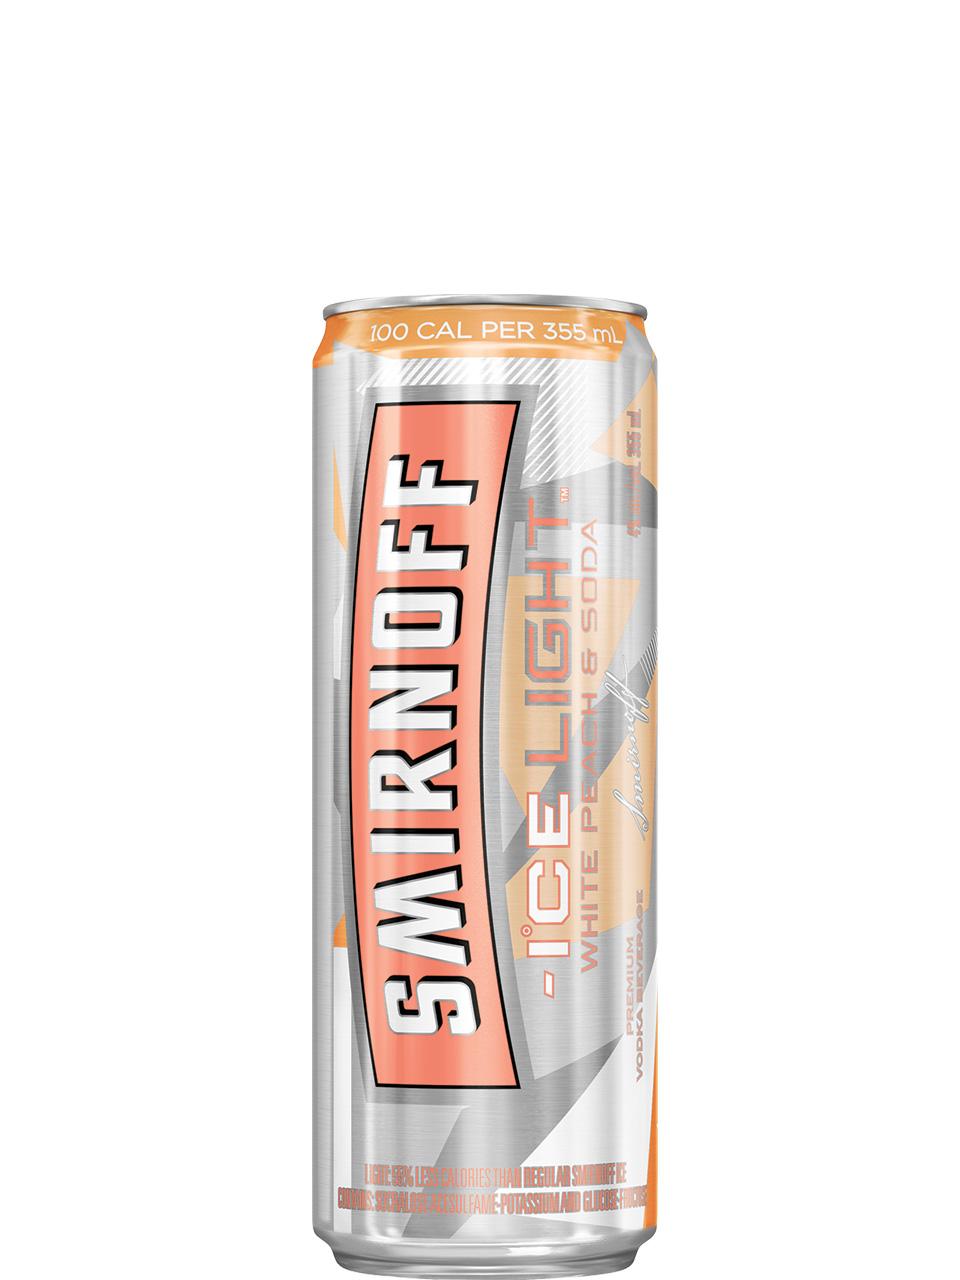 Smirnoff Ice Light White Peach & Soda 4 Pack Cans